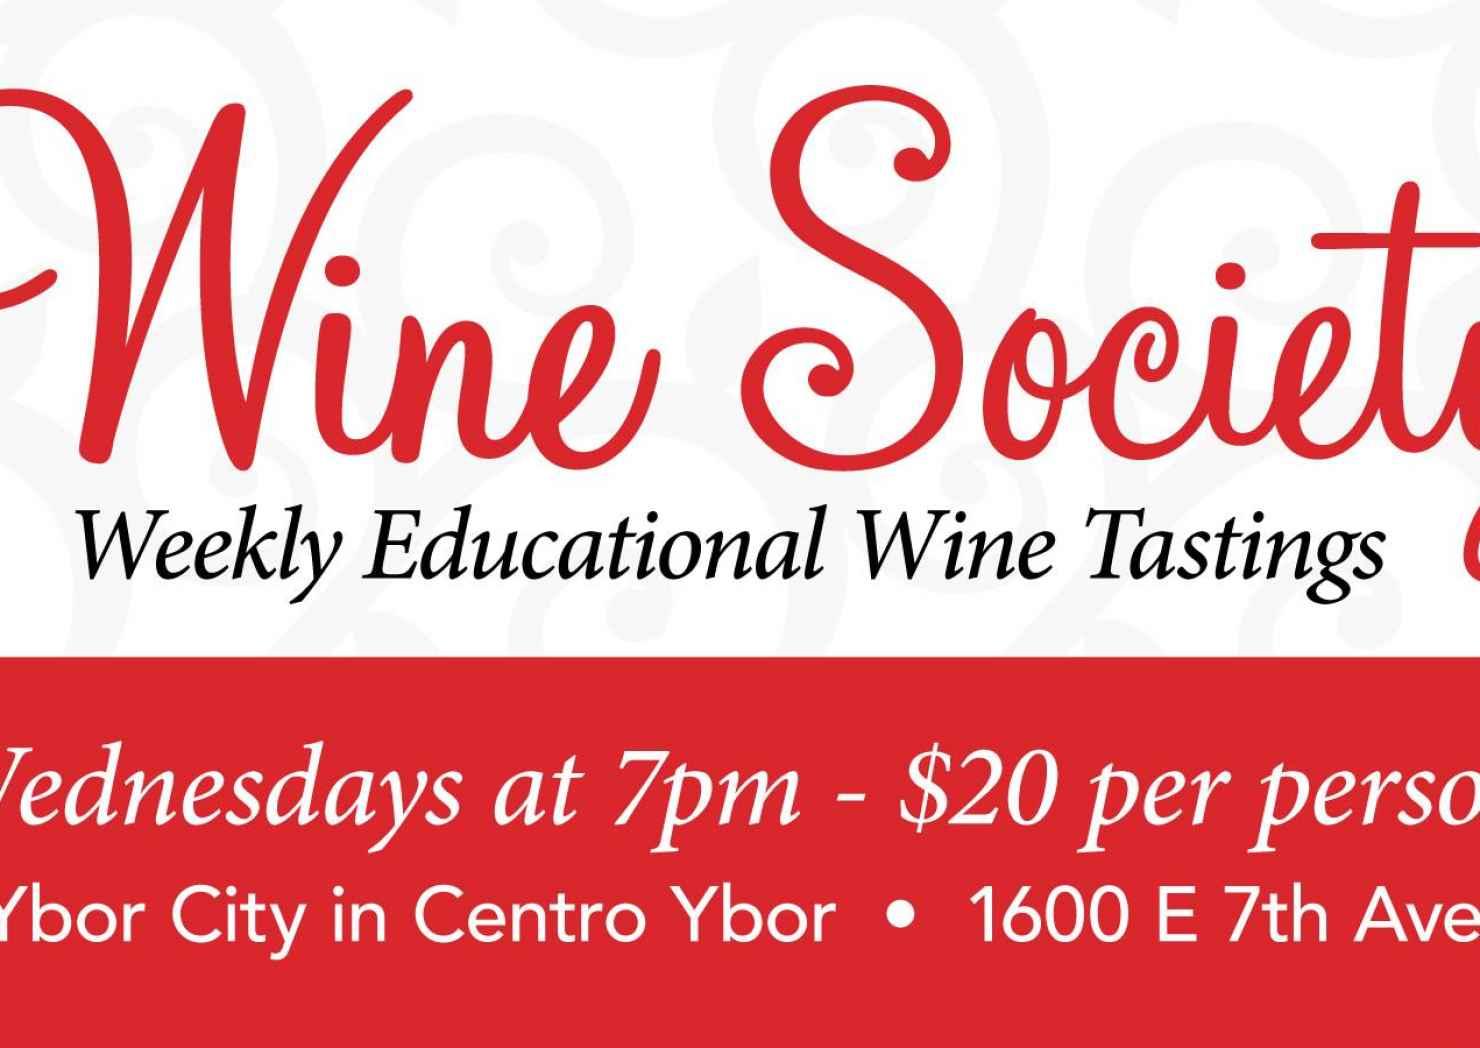 Ybor City Wine Bar – Weekly Wine Society